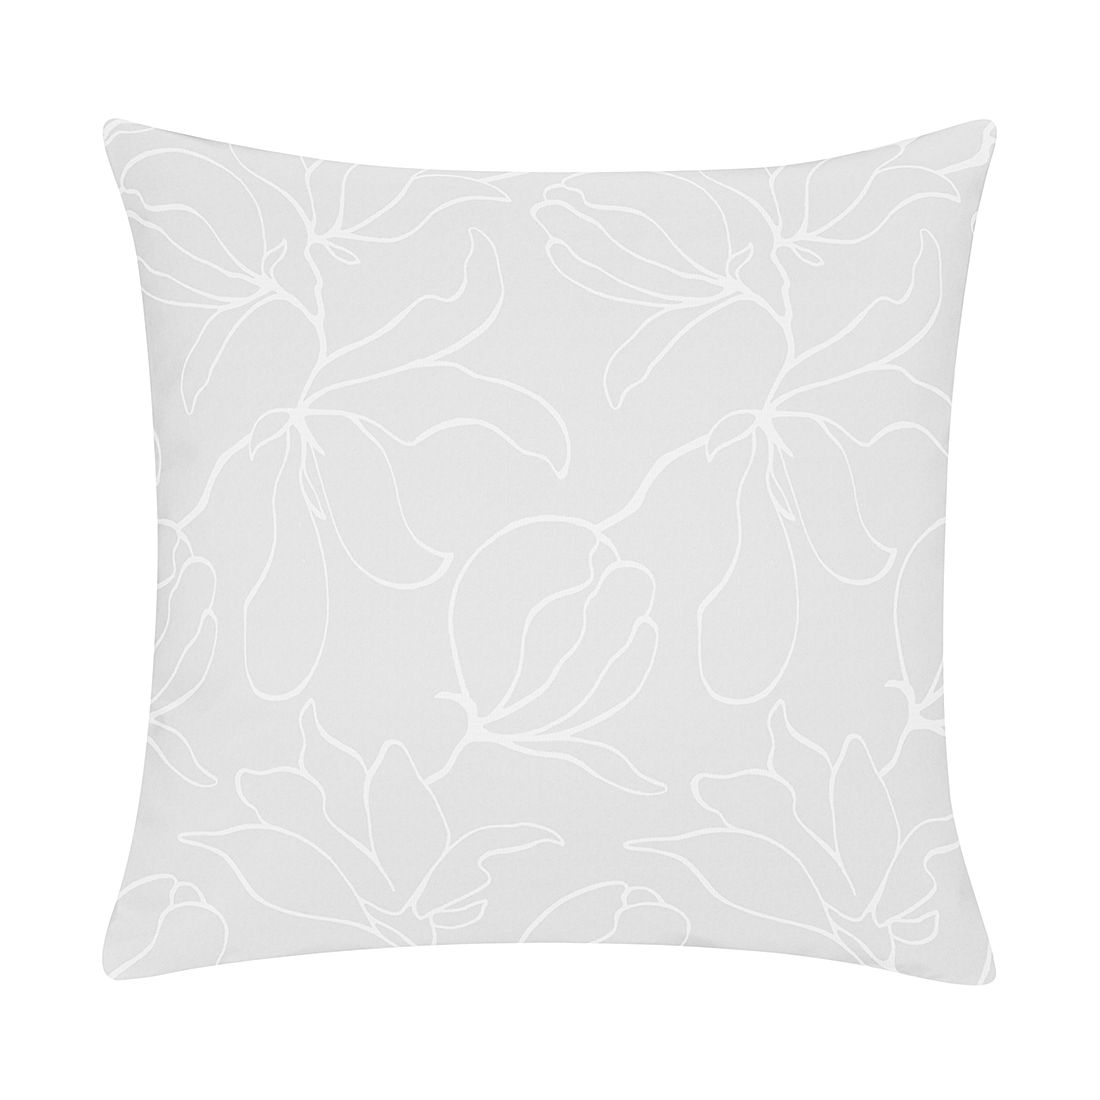 Kissenhülle Magnolia – Anthrazit – 40 x 40 cm, Apelt online bestellen